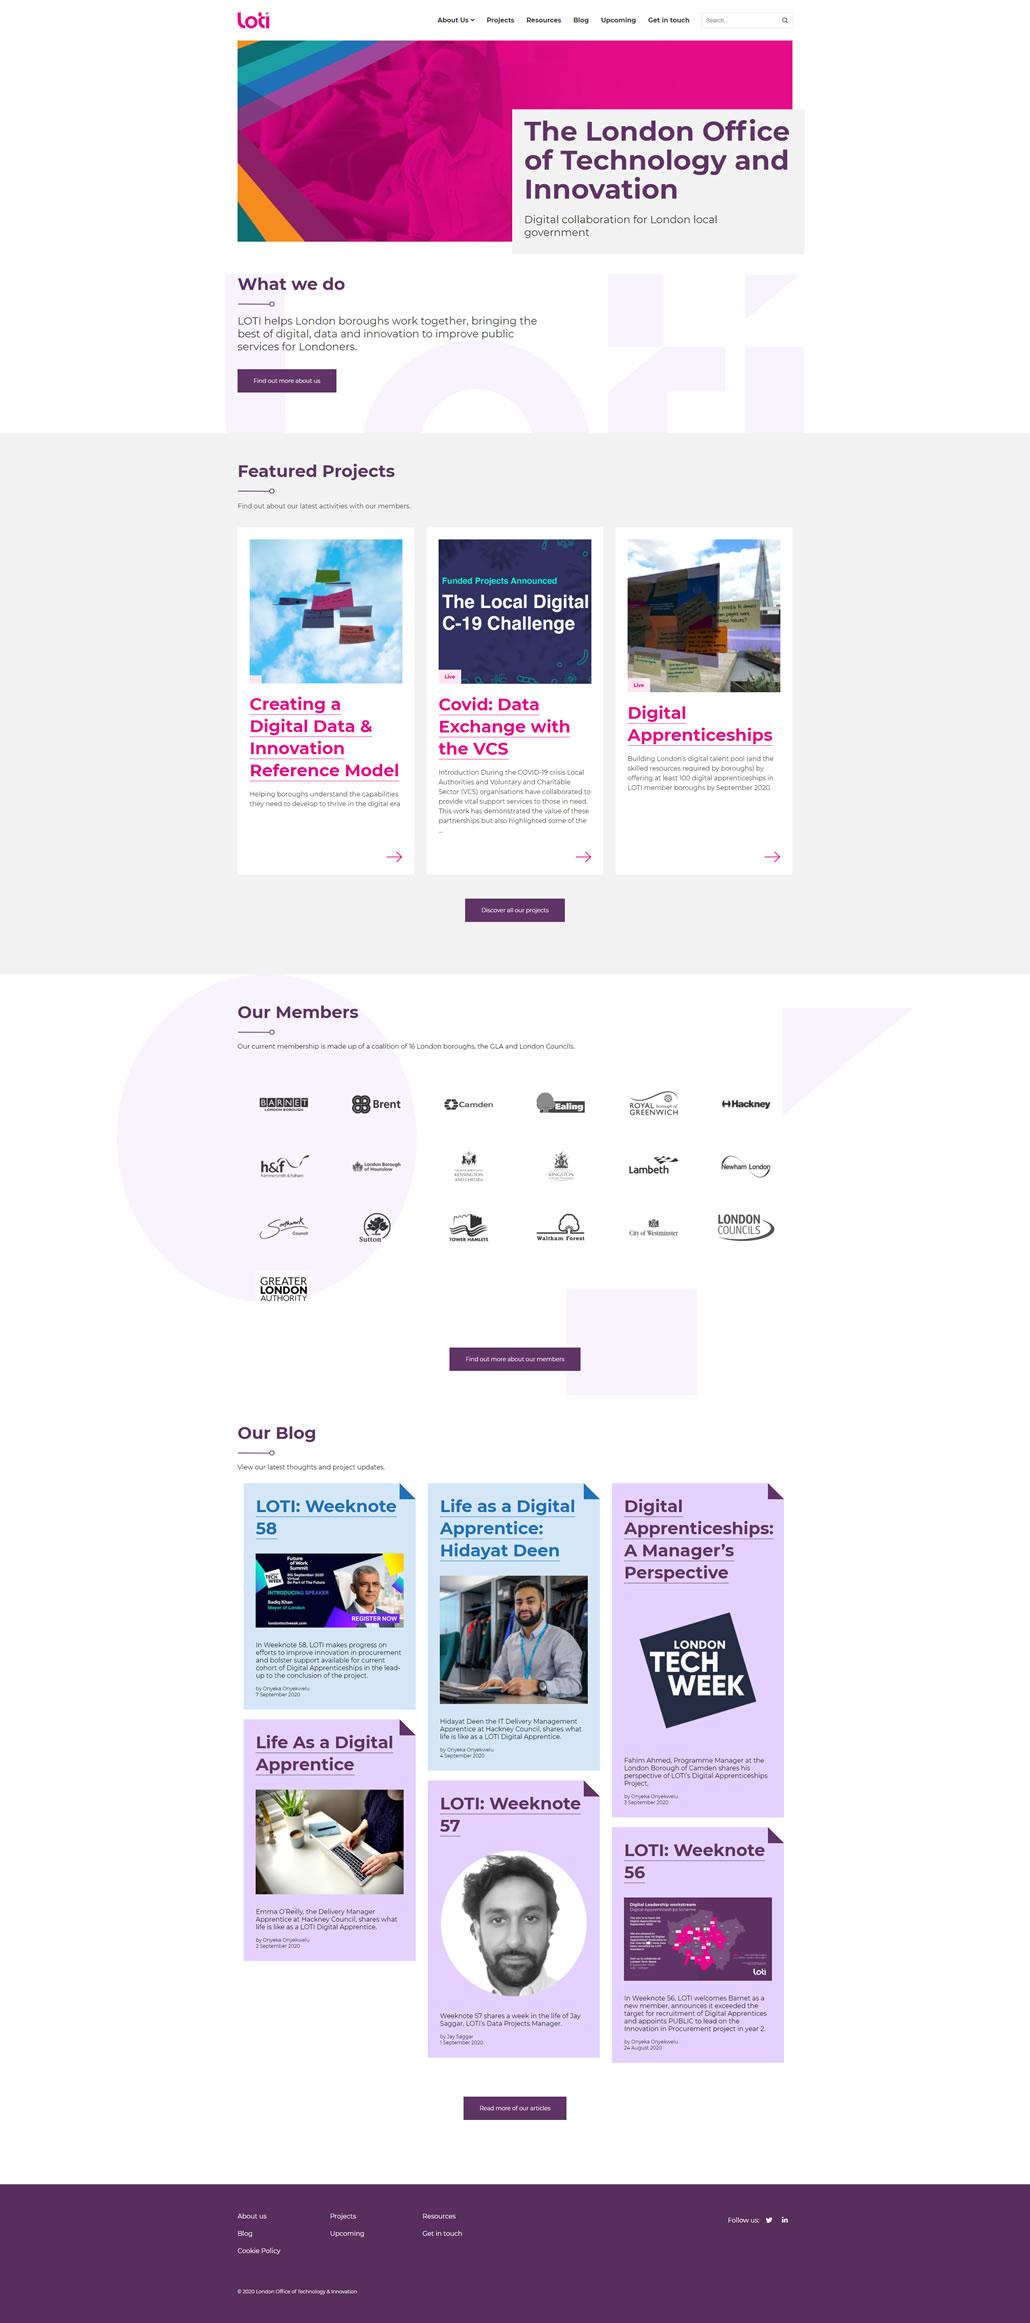 Loti built using WordPress by Convoy Media